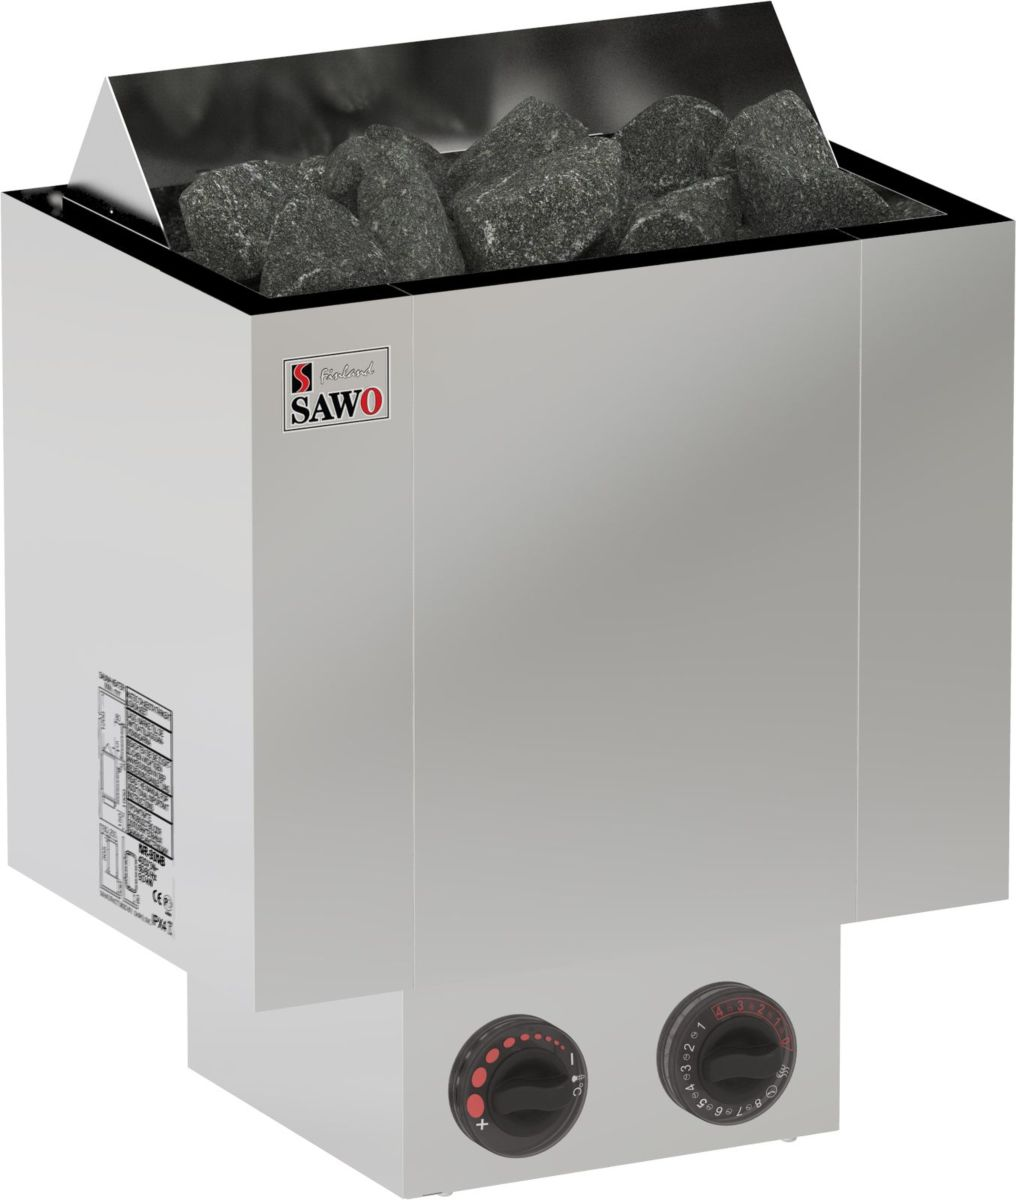 Печь для бани SAWO Nordex NRX-90NB